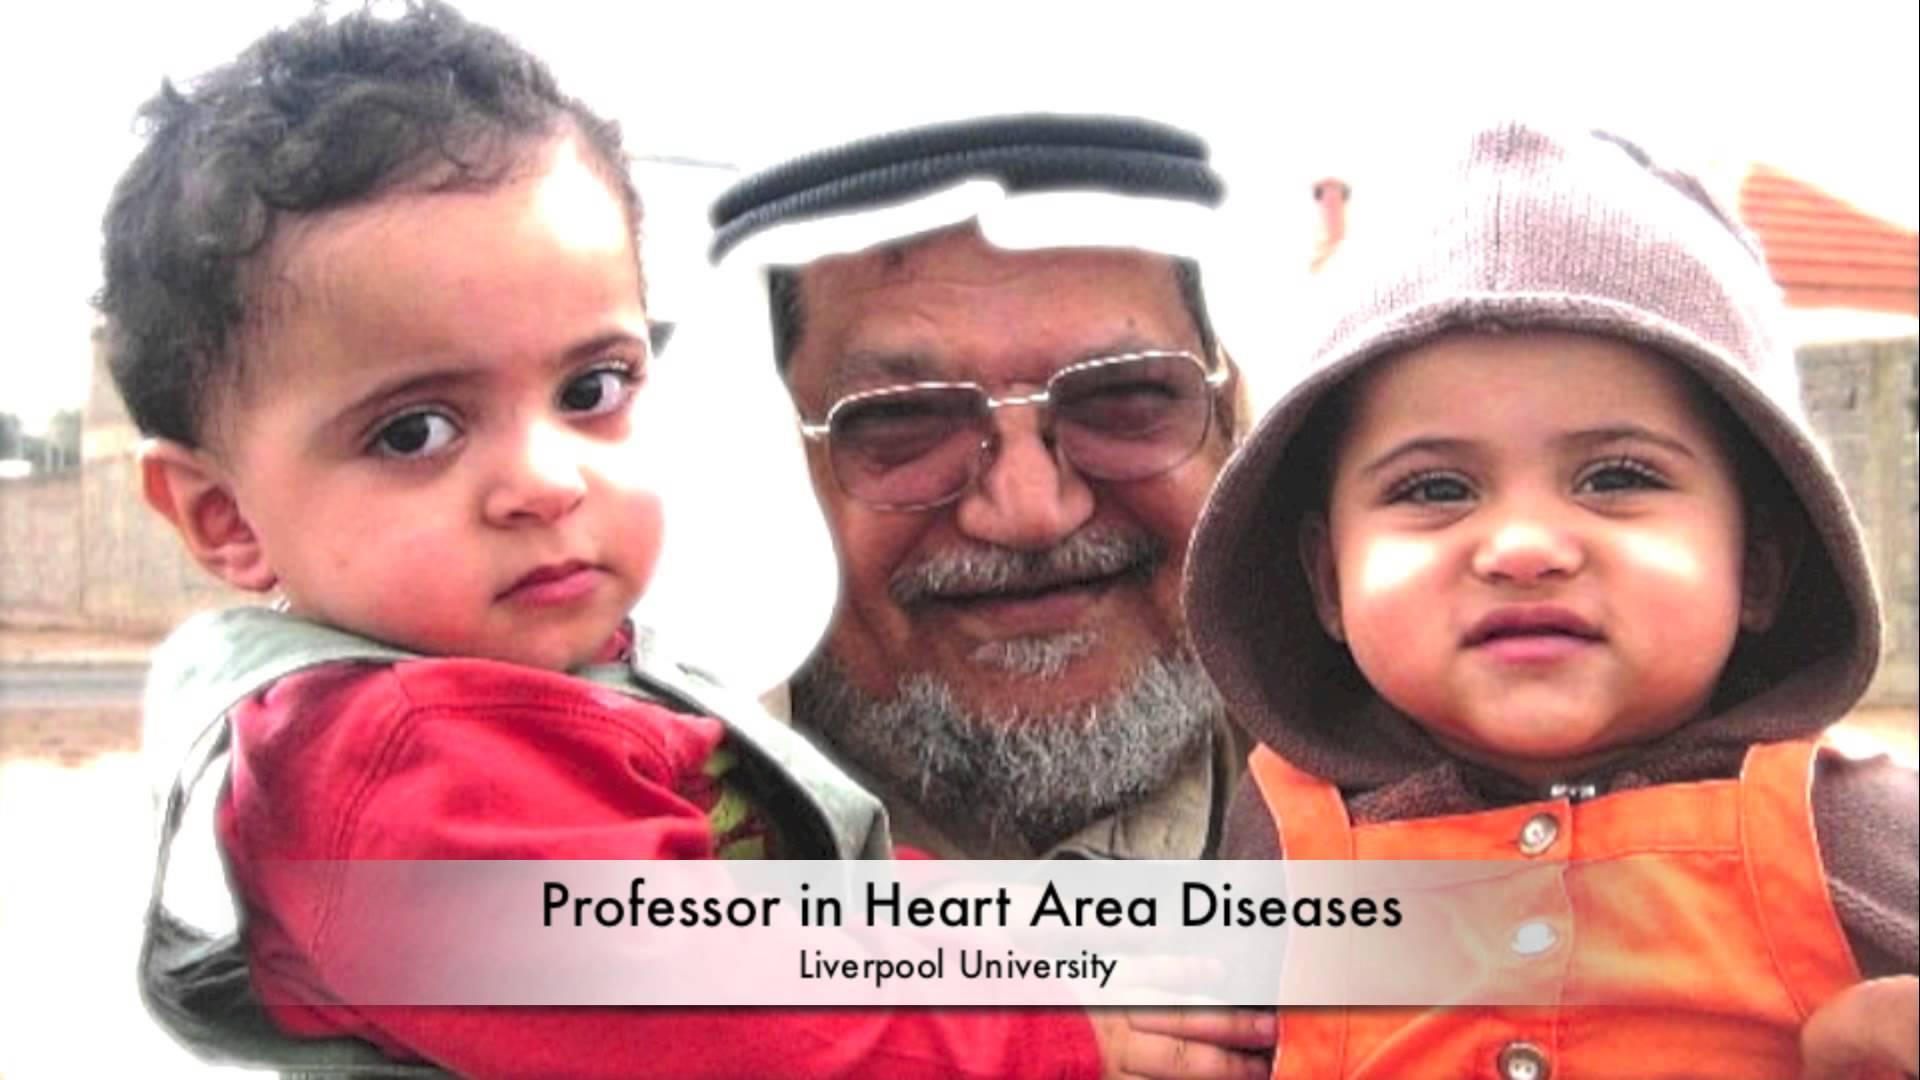 The Biography of Dr. Abd Al-Rahman Al-Sumait